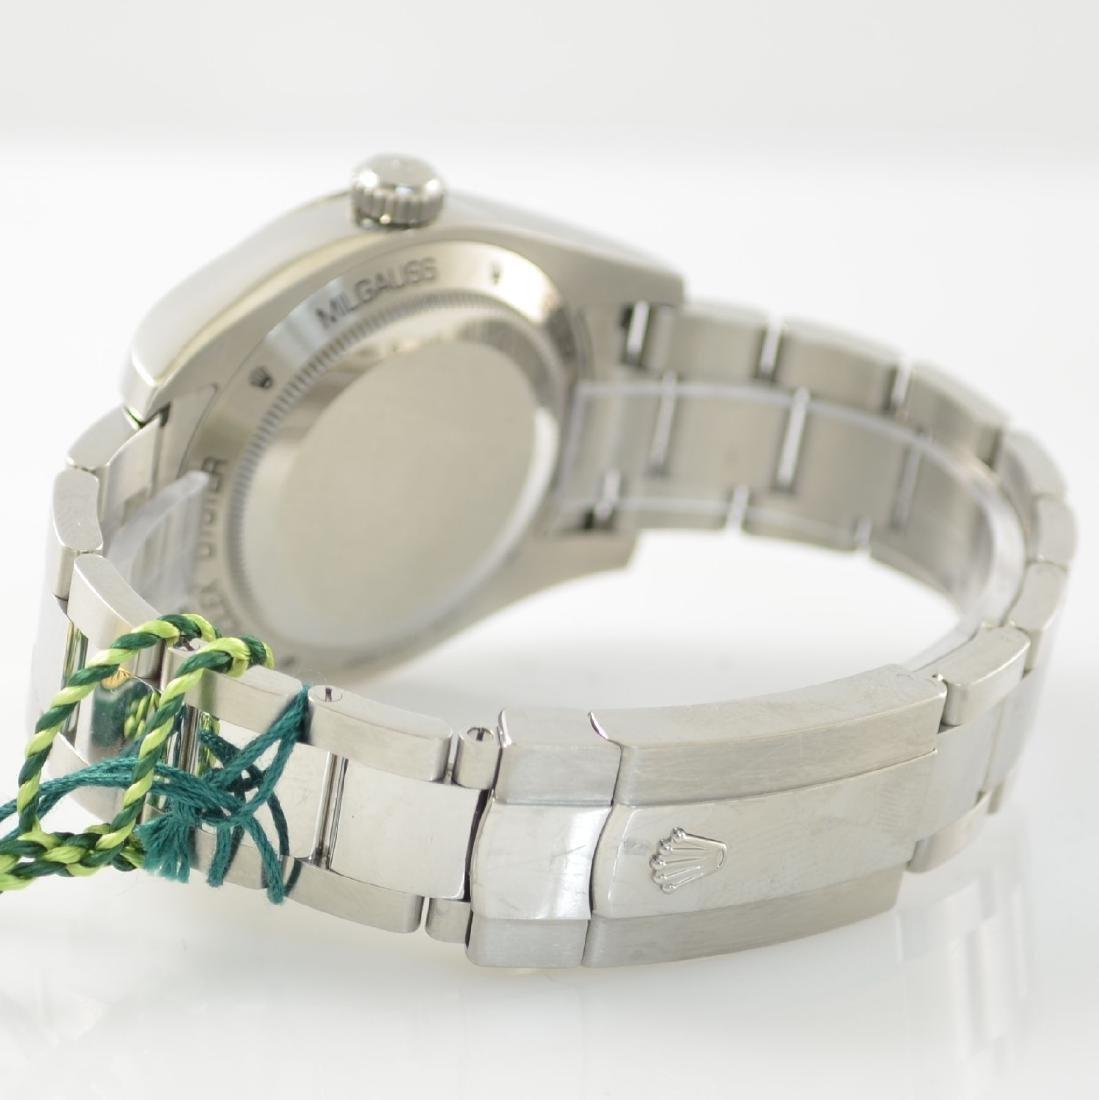 ROLEX wristwatch Oyster Perpetual Milgauss 116400GV - 5